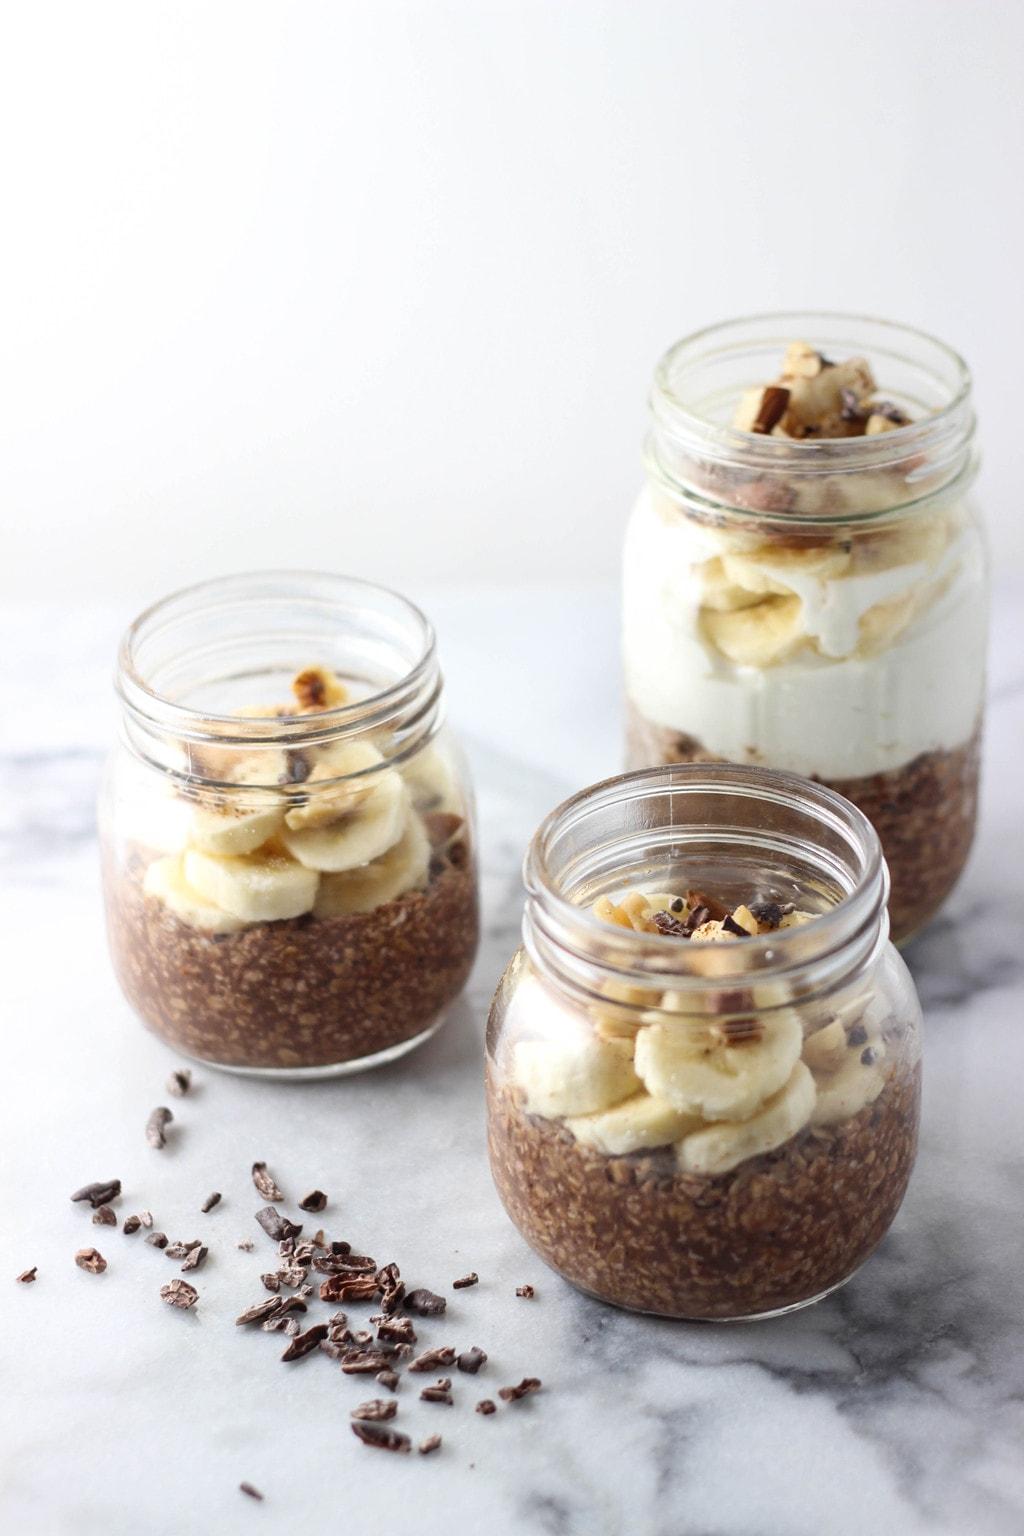 Chocolate Banana Nut Overnight Oats - Exploring Healthy Foods